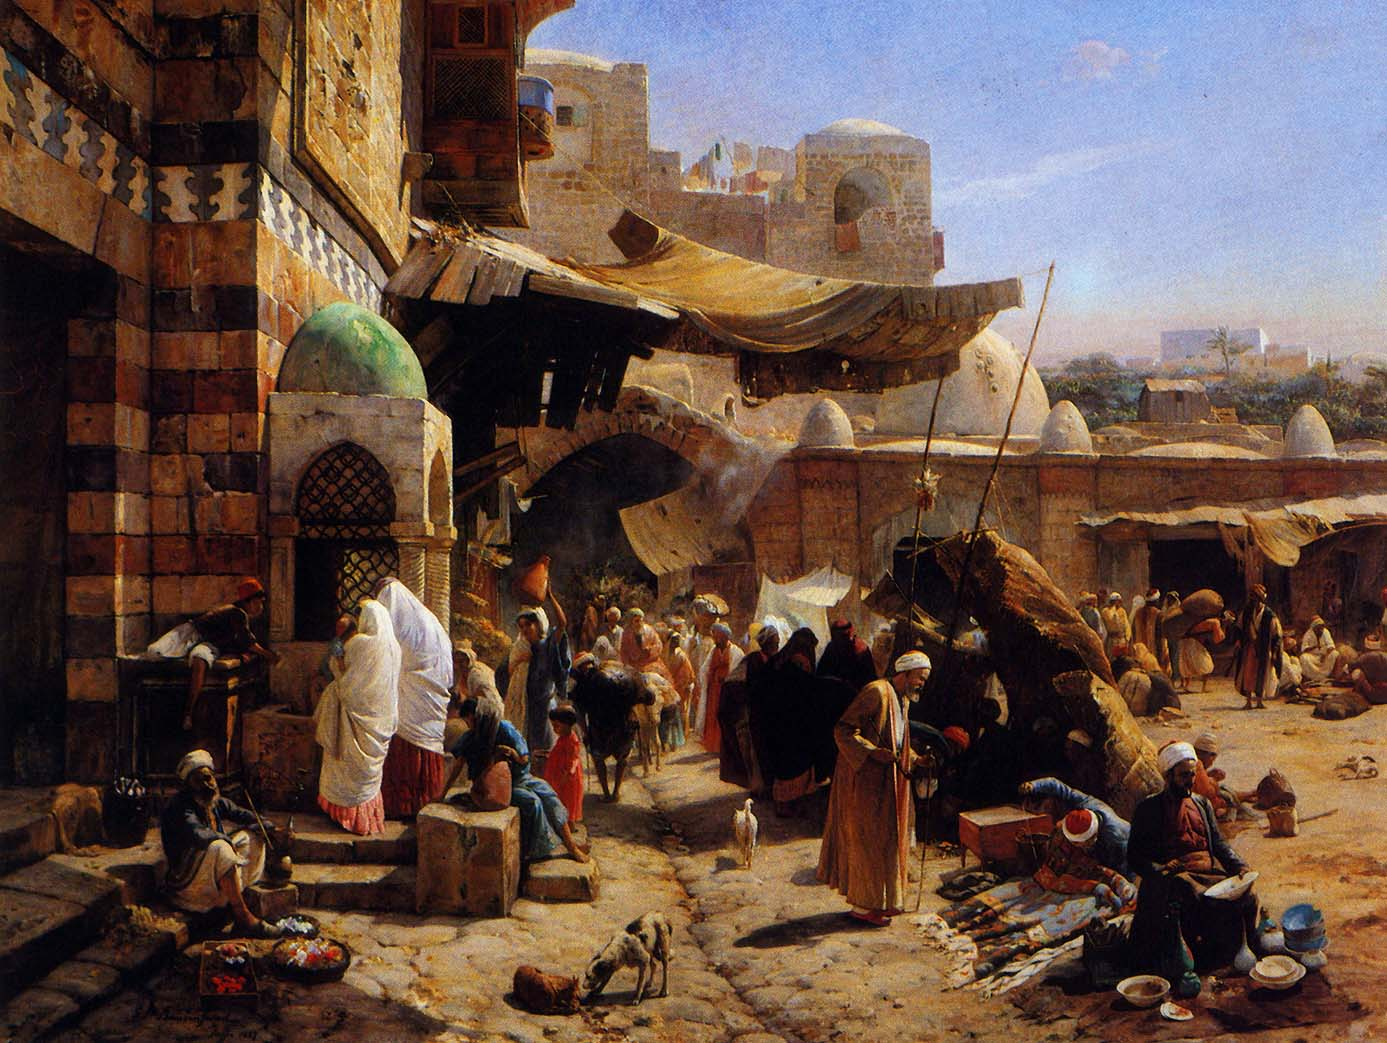 ʿUmar ibn al-Khaṭṭāb, le calife et compagnon en anecdotes